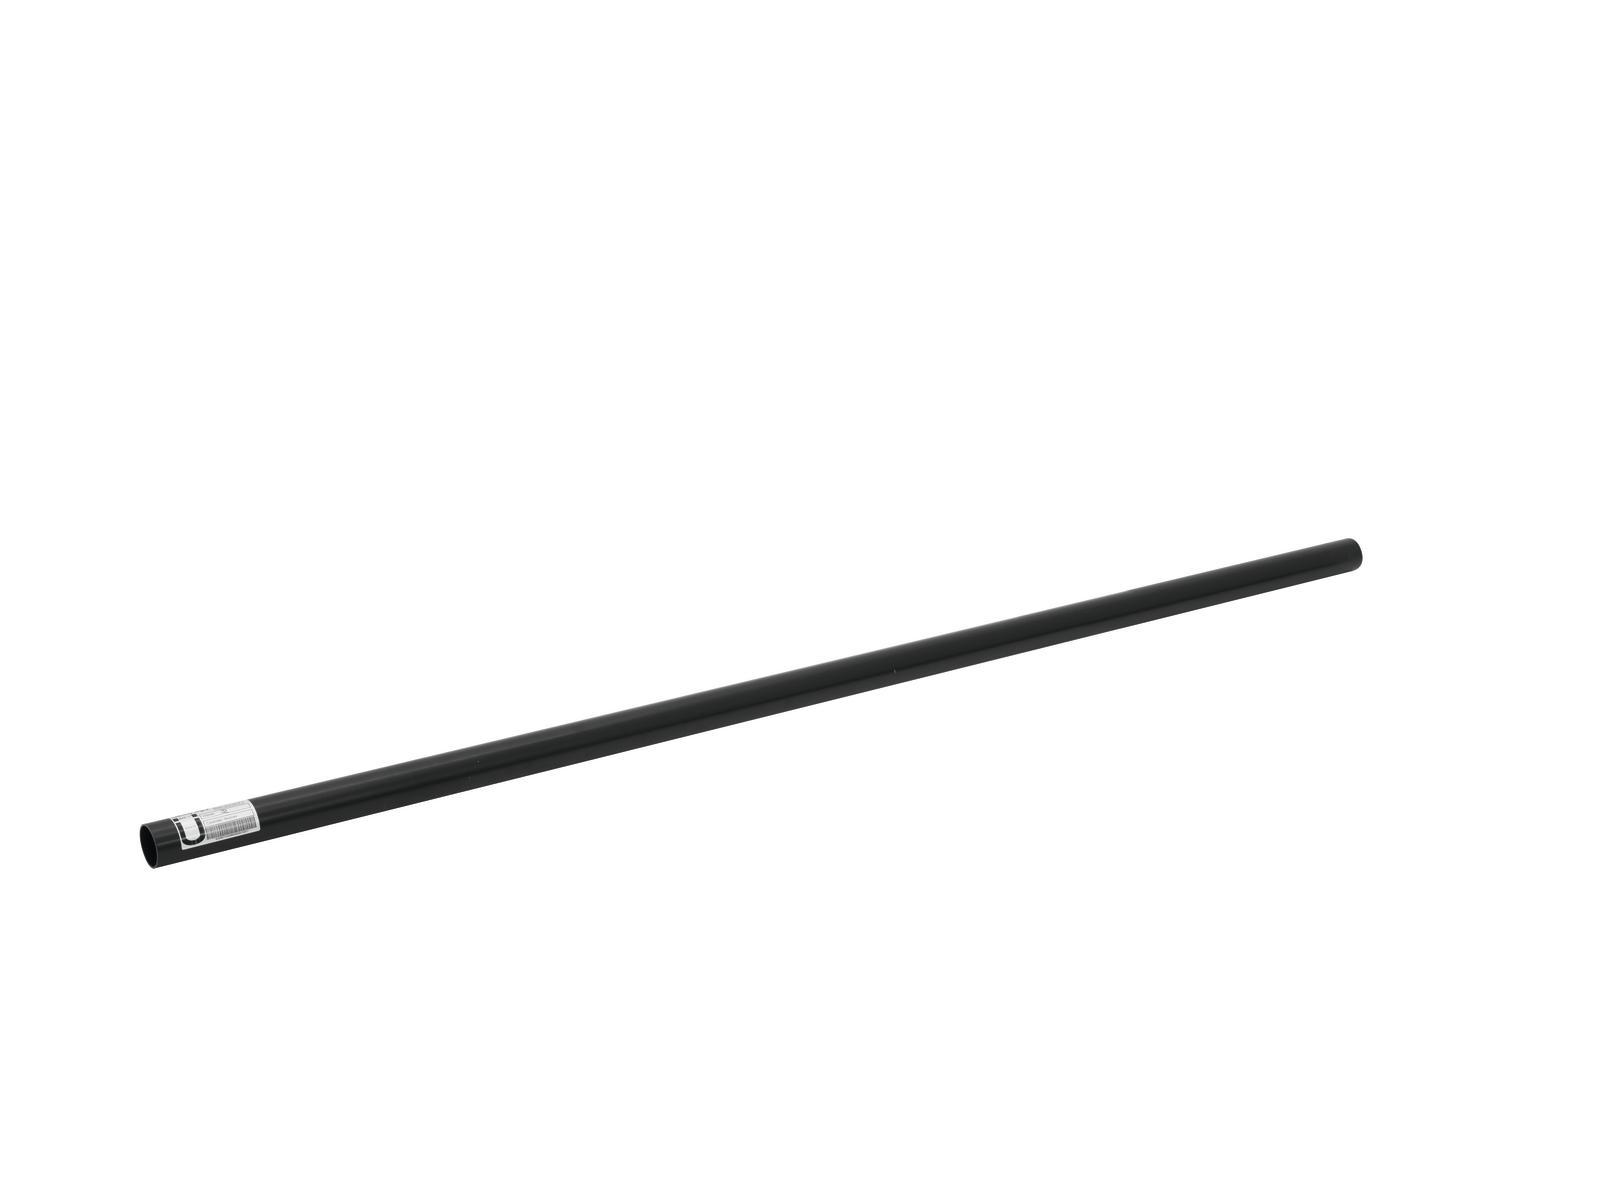 ALUTRUSS Alurohr 6082 50x2mm 2m schwarz